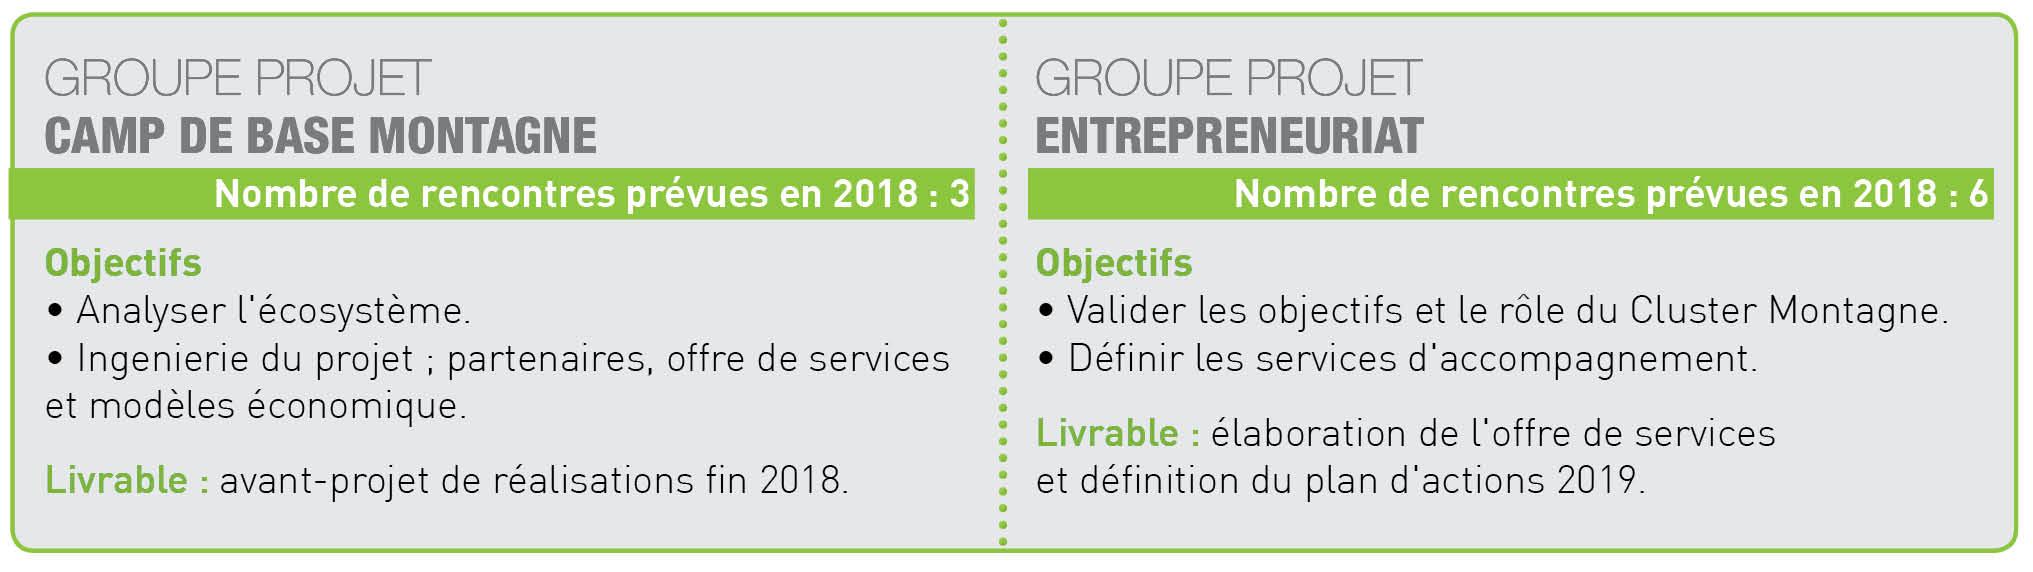 GP_pole_businee_entrepreneuriat